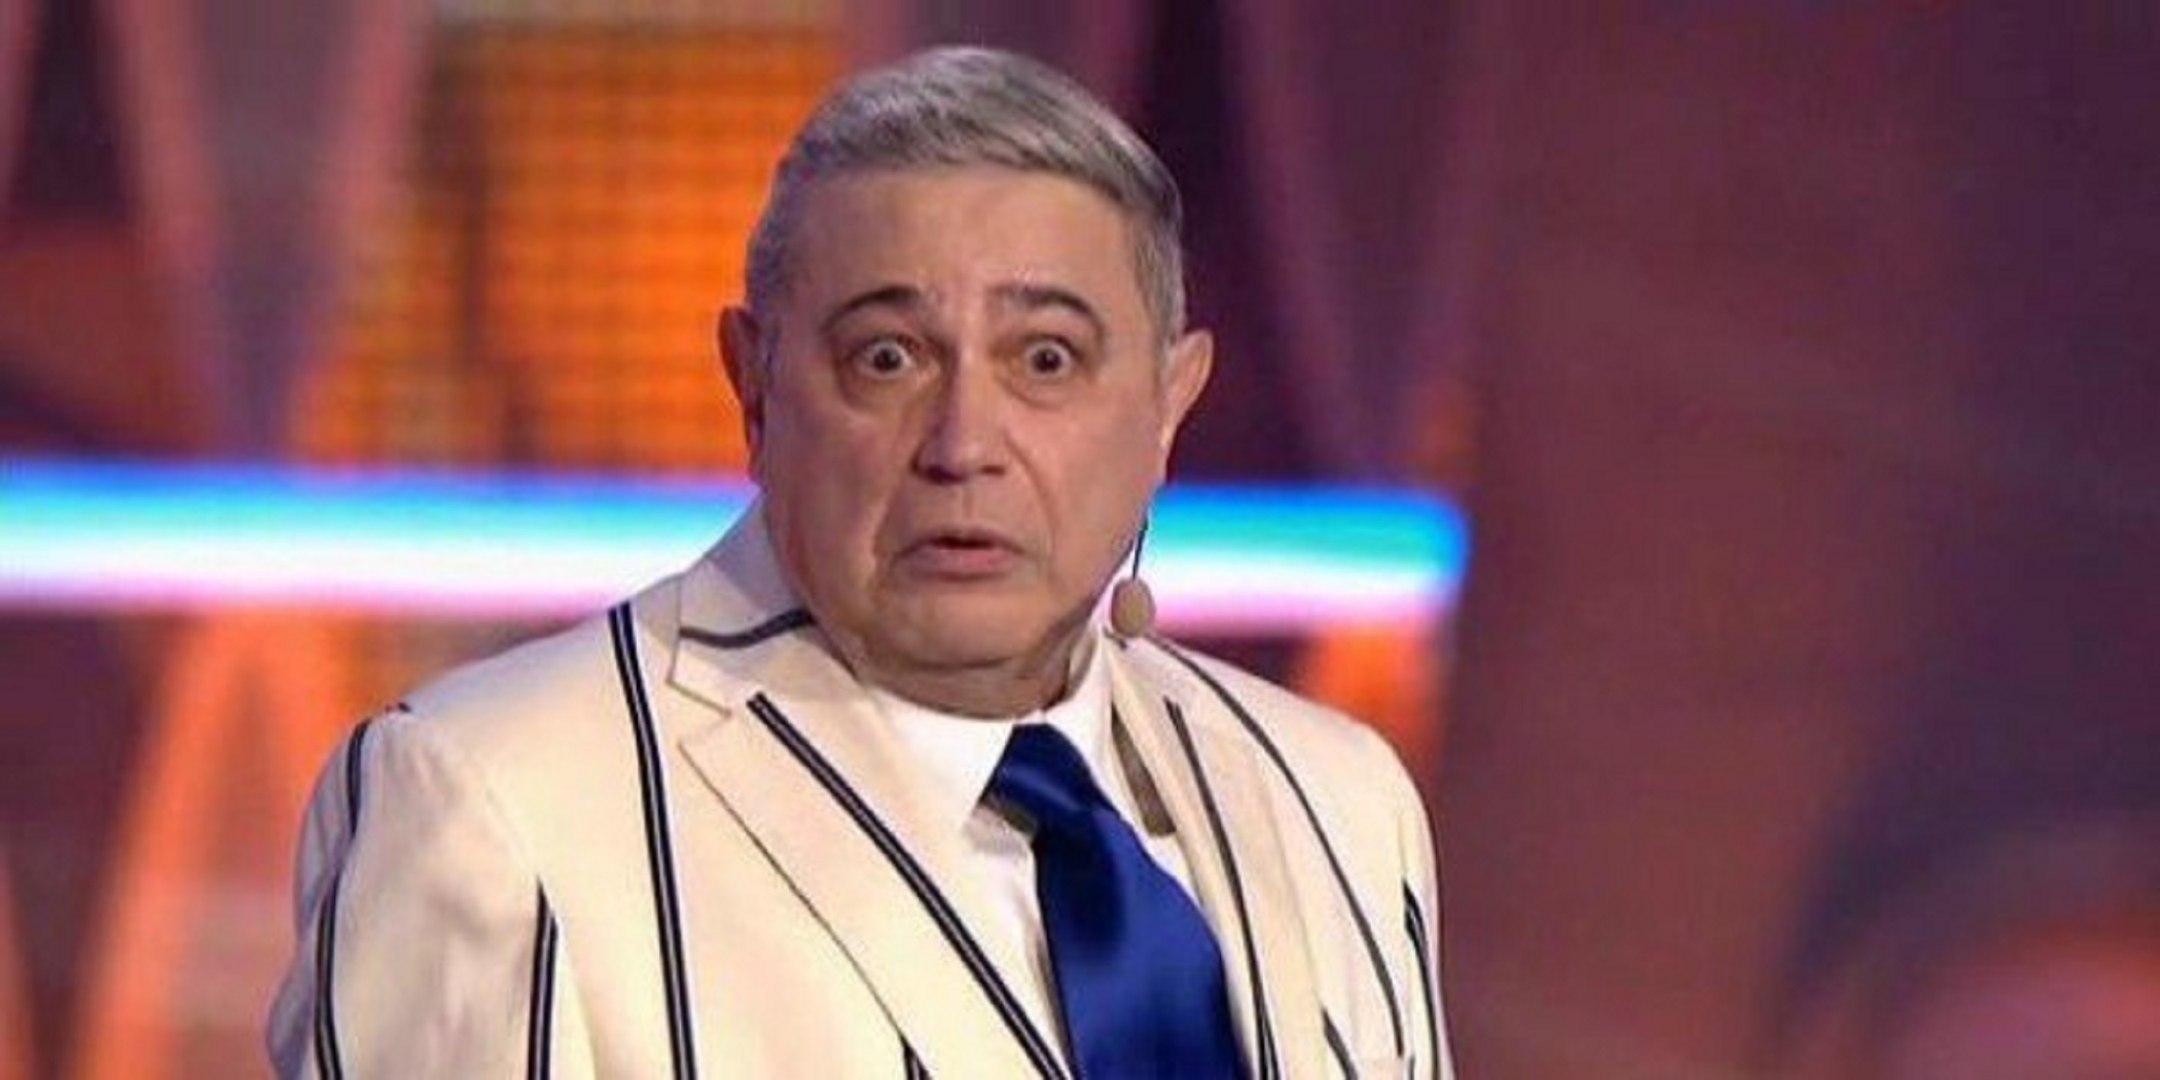 ПЕТРОСЯН - Монолог - ГОРИЛЛА. Юмор Анекдоты. Humour. Funny People